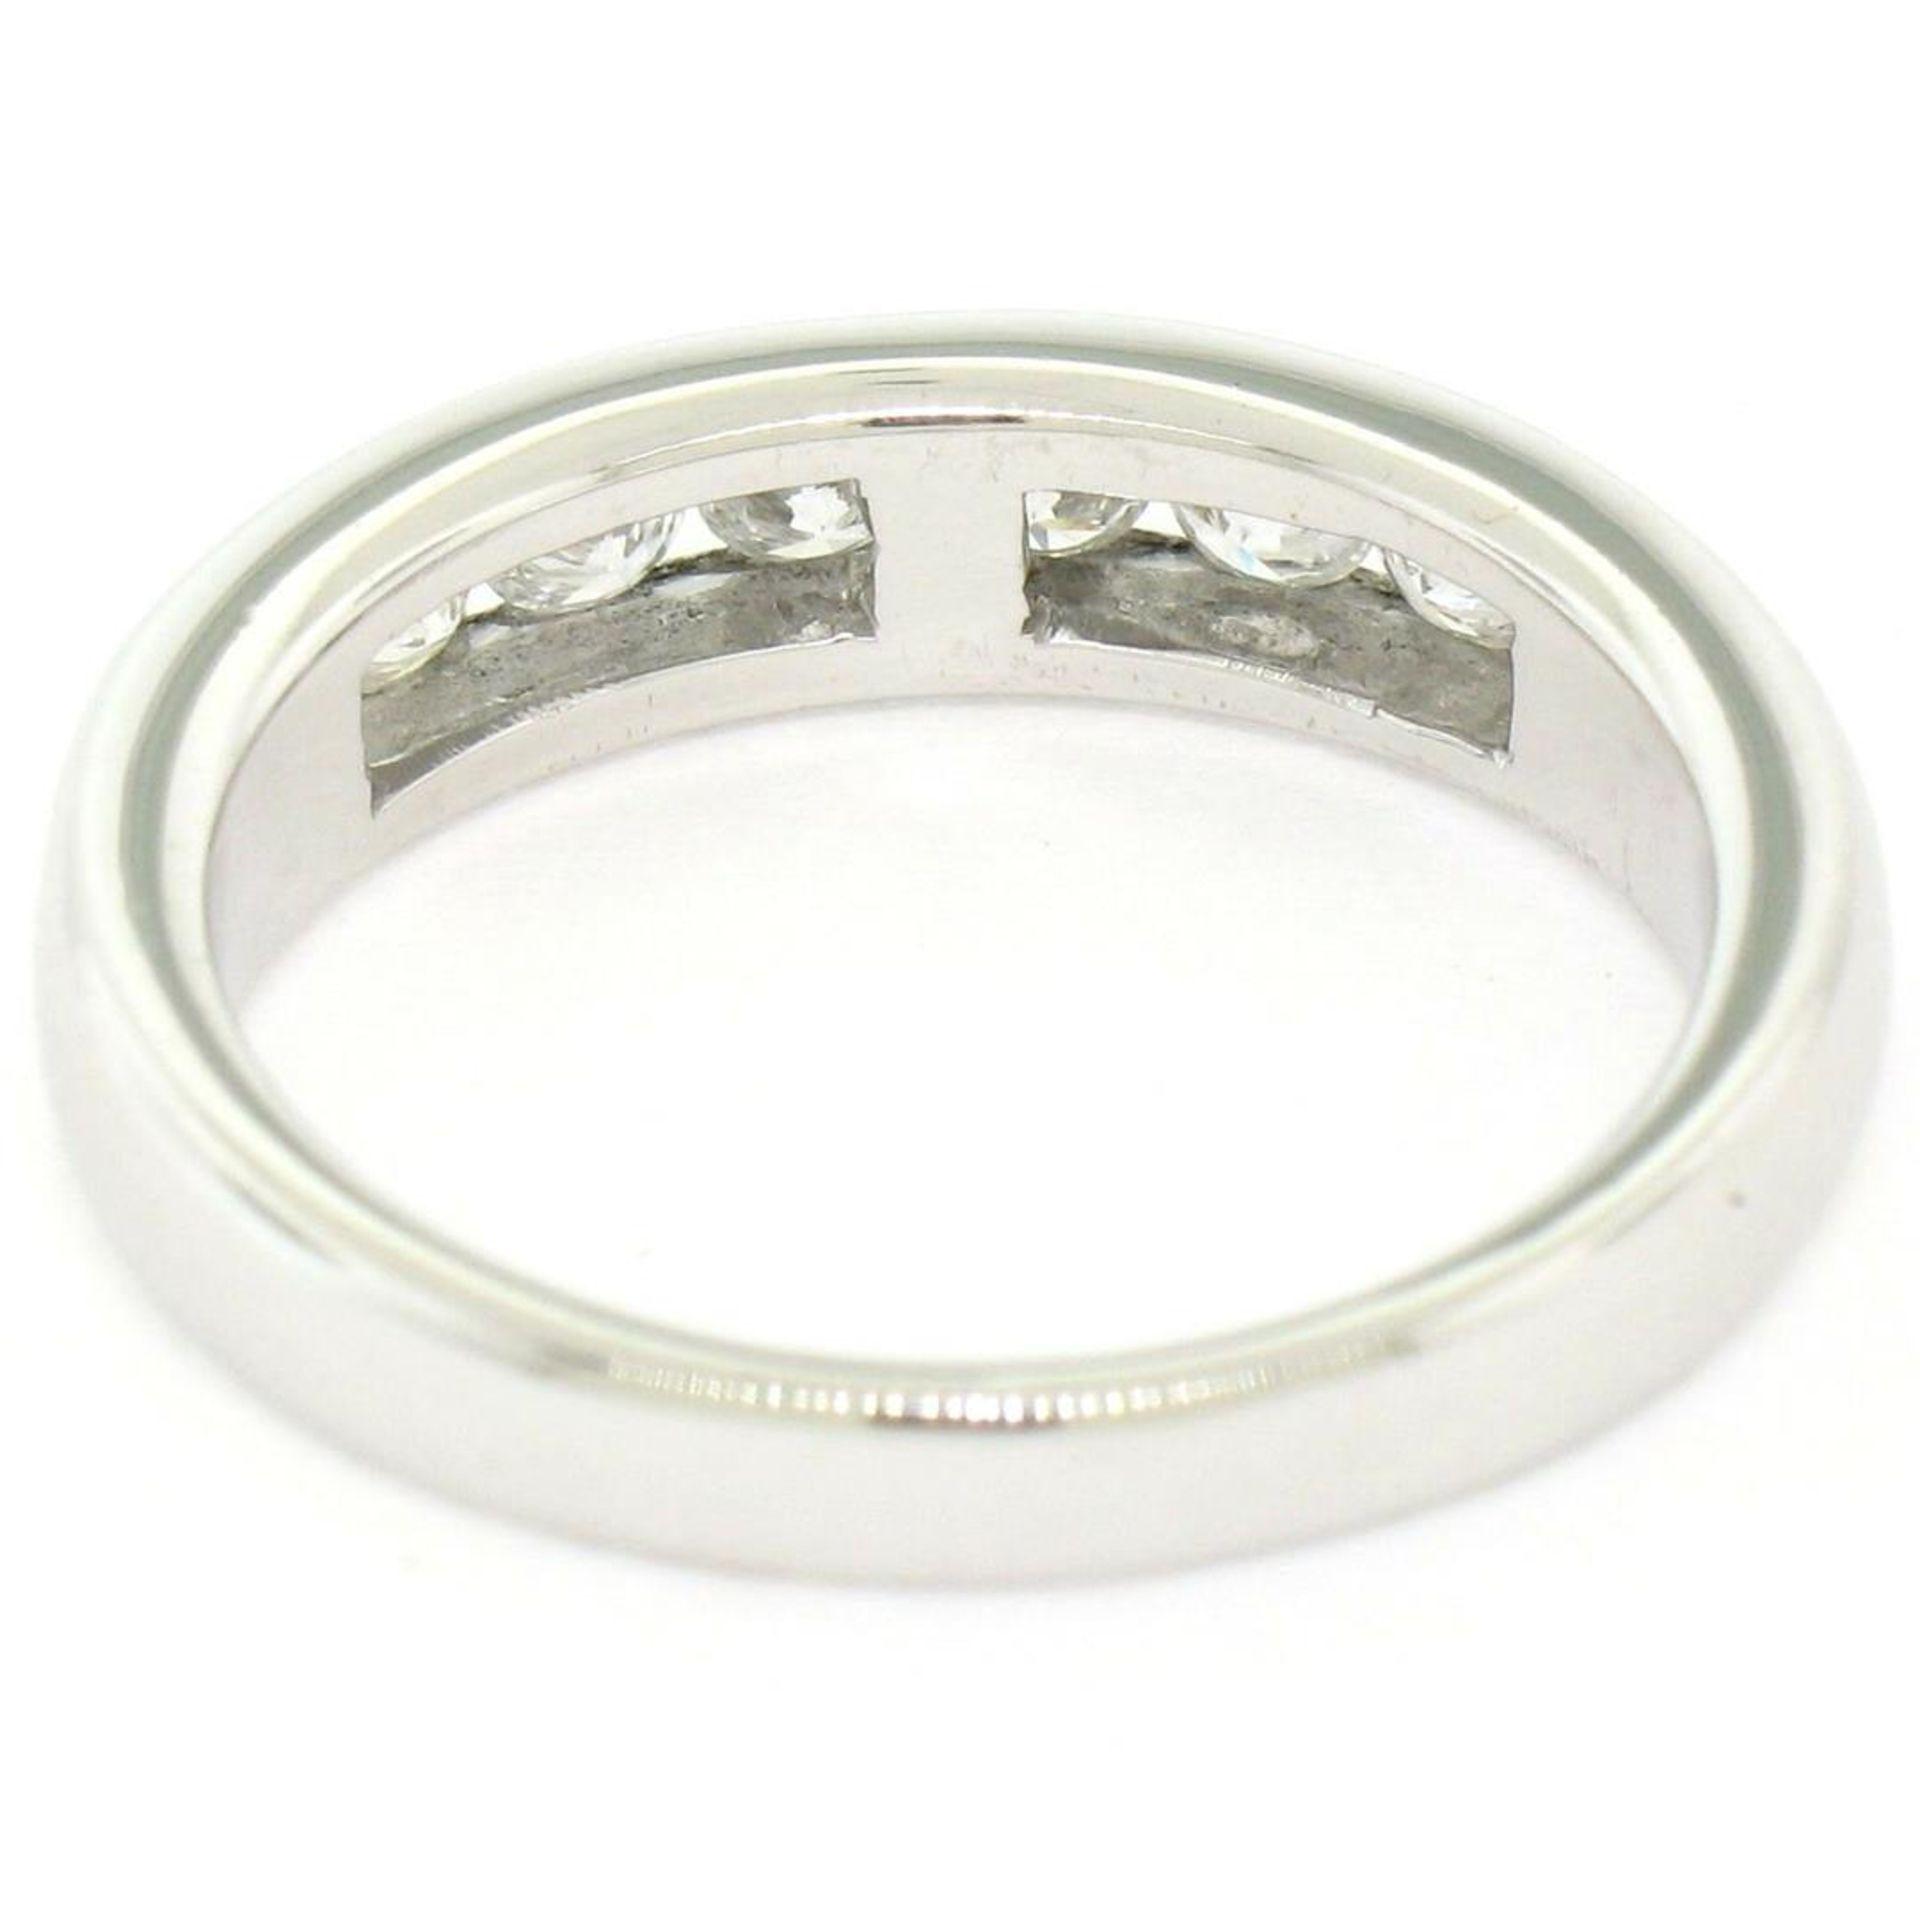 Classic Platinum .80ctw Channel Set Round Brilliant VS Diamond Wedding Band Ring - Image 7 of 8